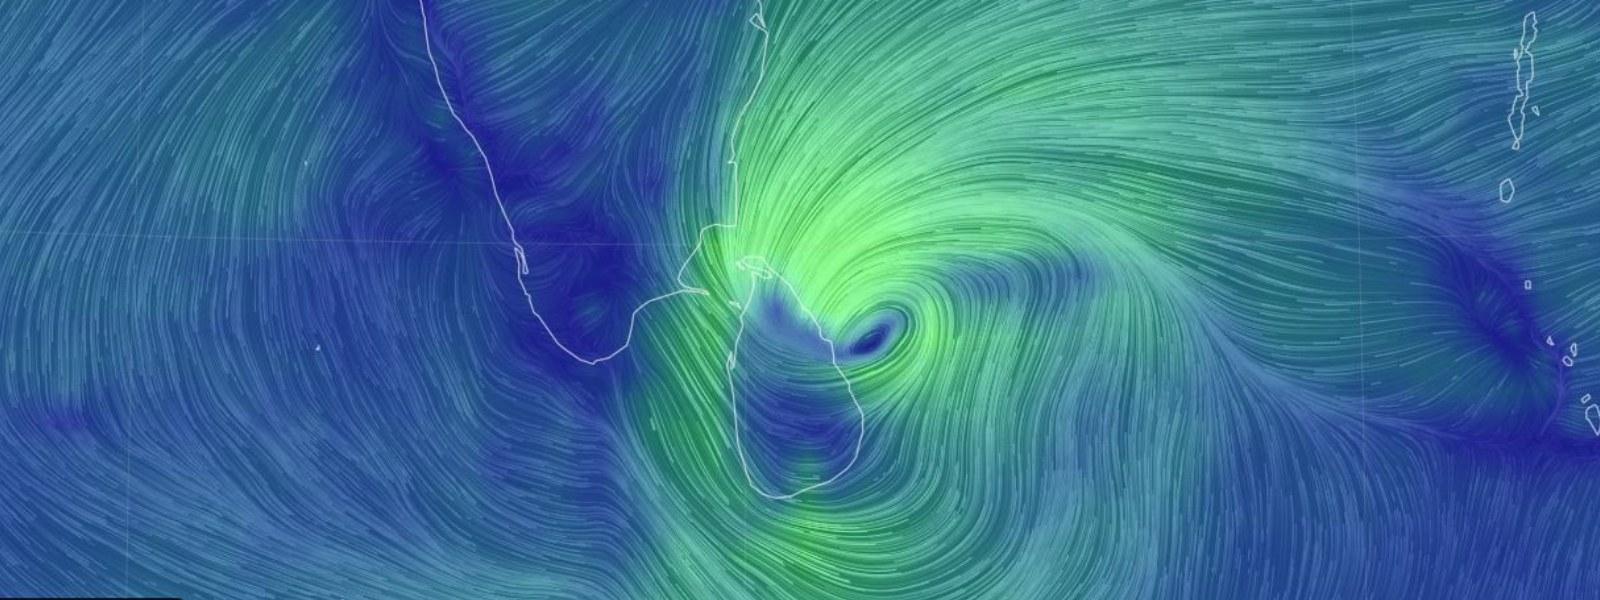 Cyclone BUREVI 110 km off Sri Lanka's Eastern coast